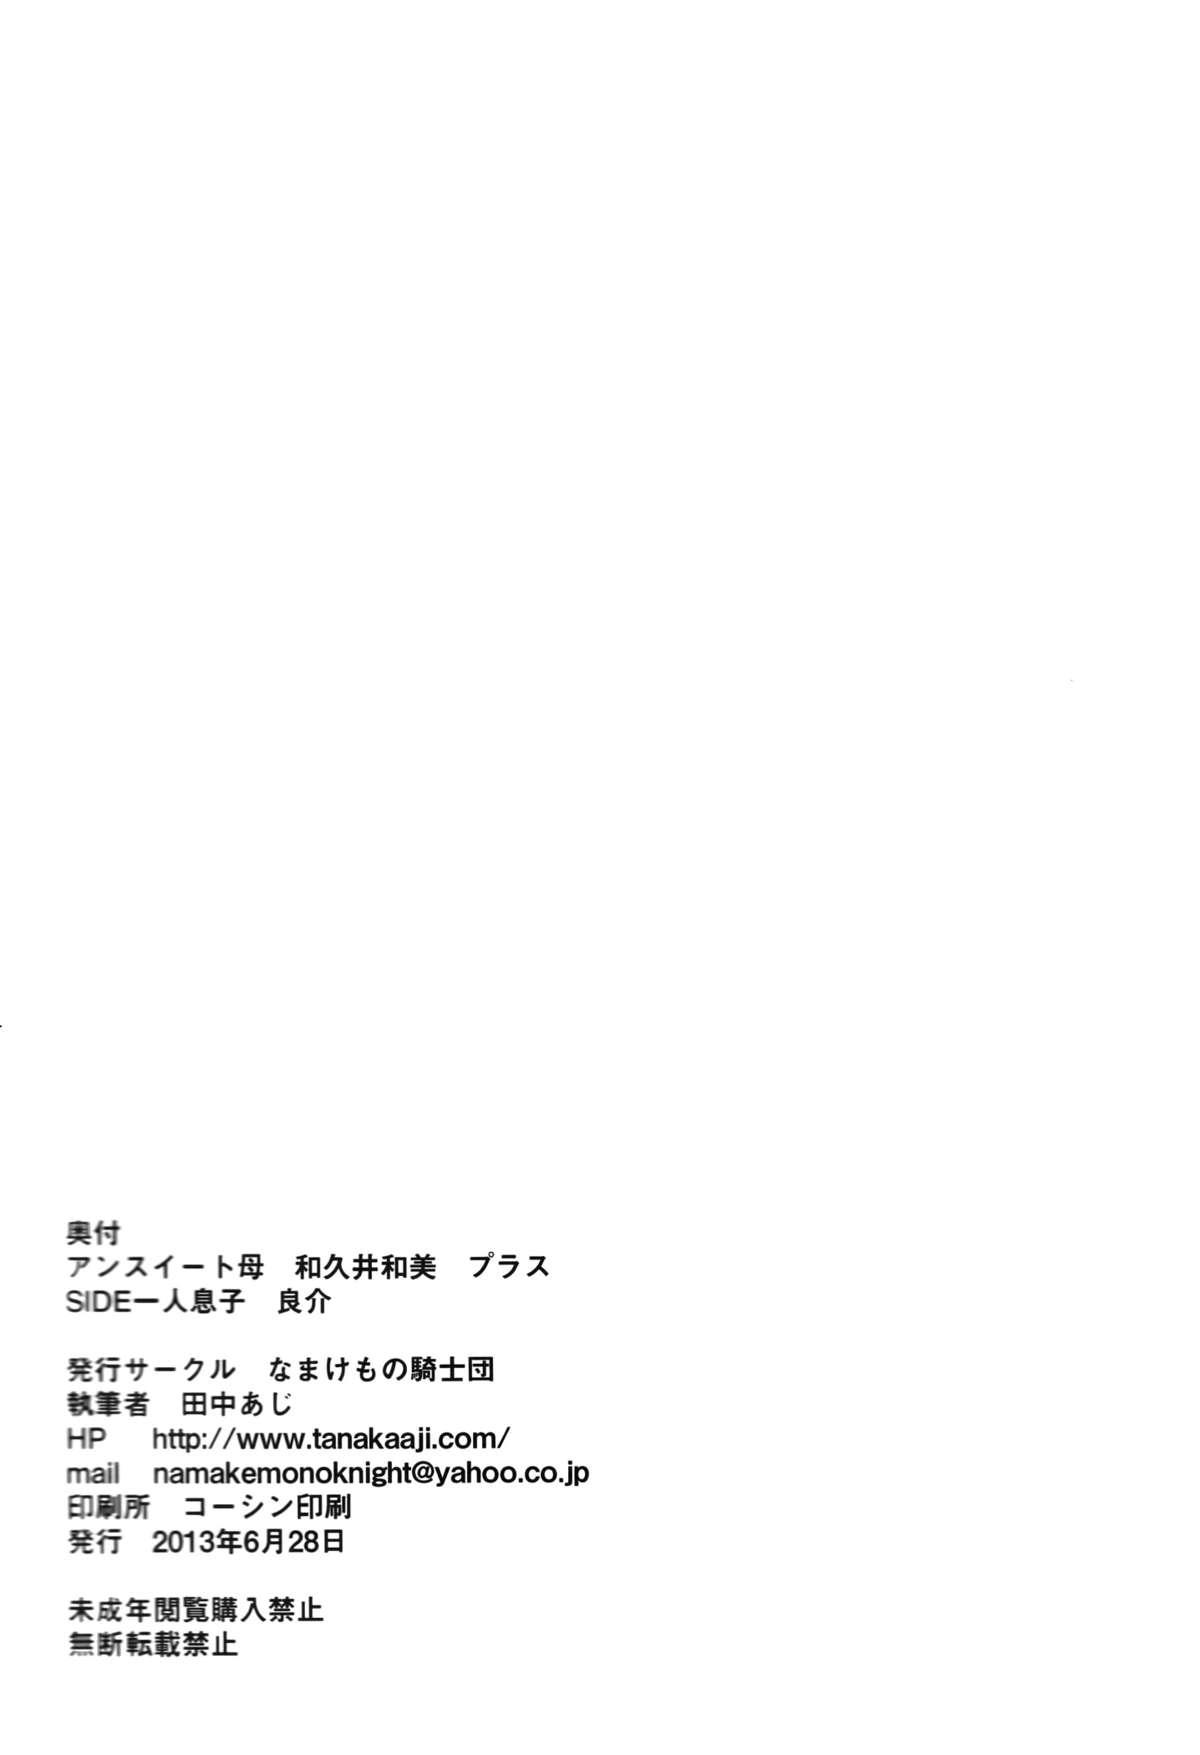 UnSweet Haha Wakui Kazumi Plus SIDE Hitori Musuko Ryousuke   Unsweet Mom Aimi Wakui - SIDE her only son Yoshisuke 67